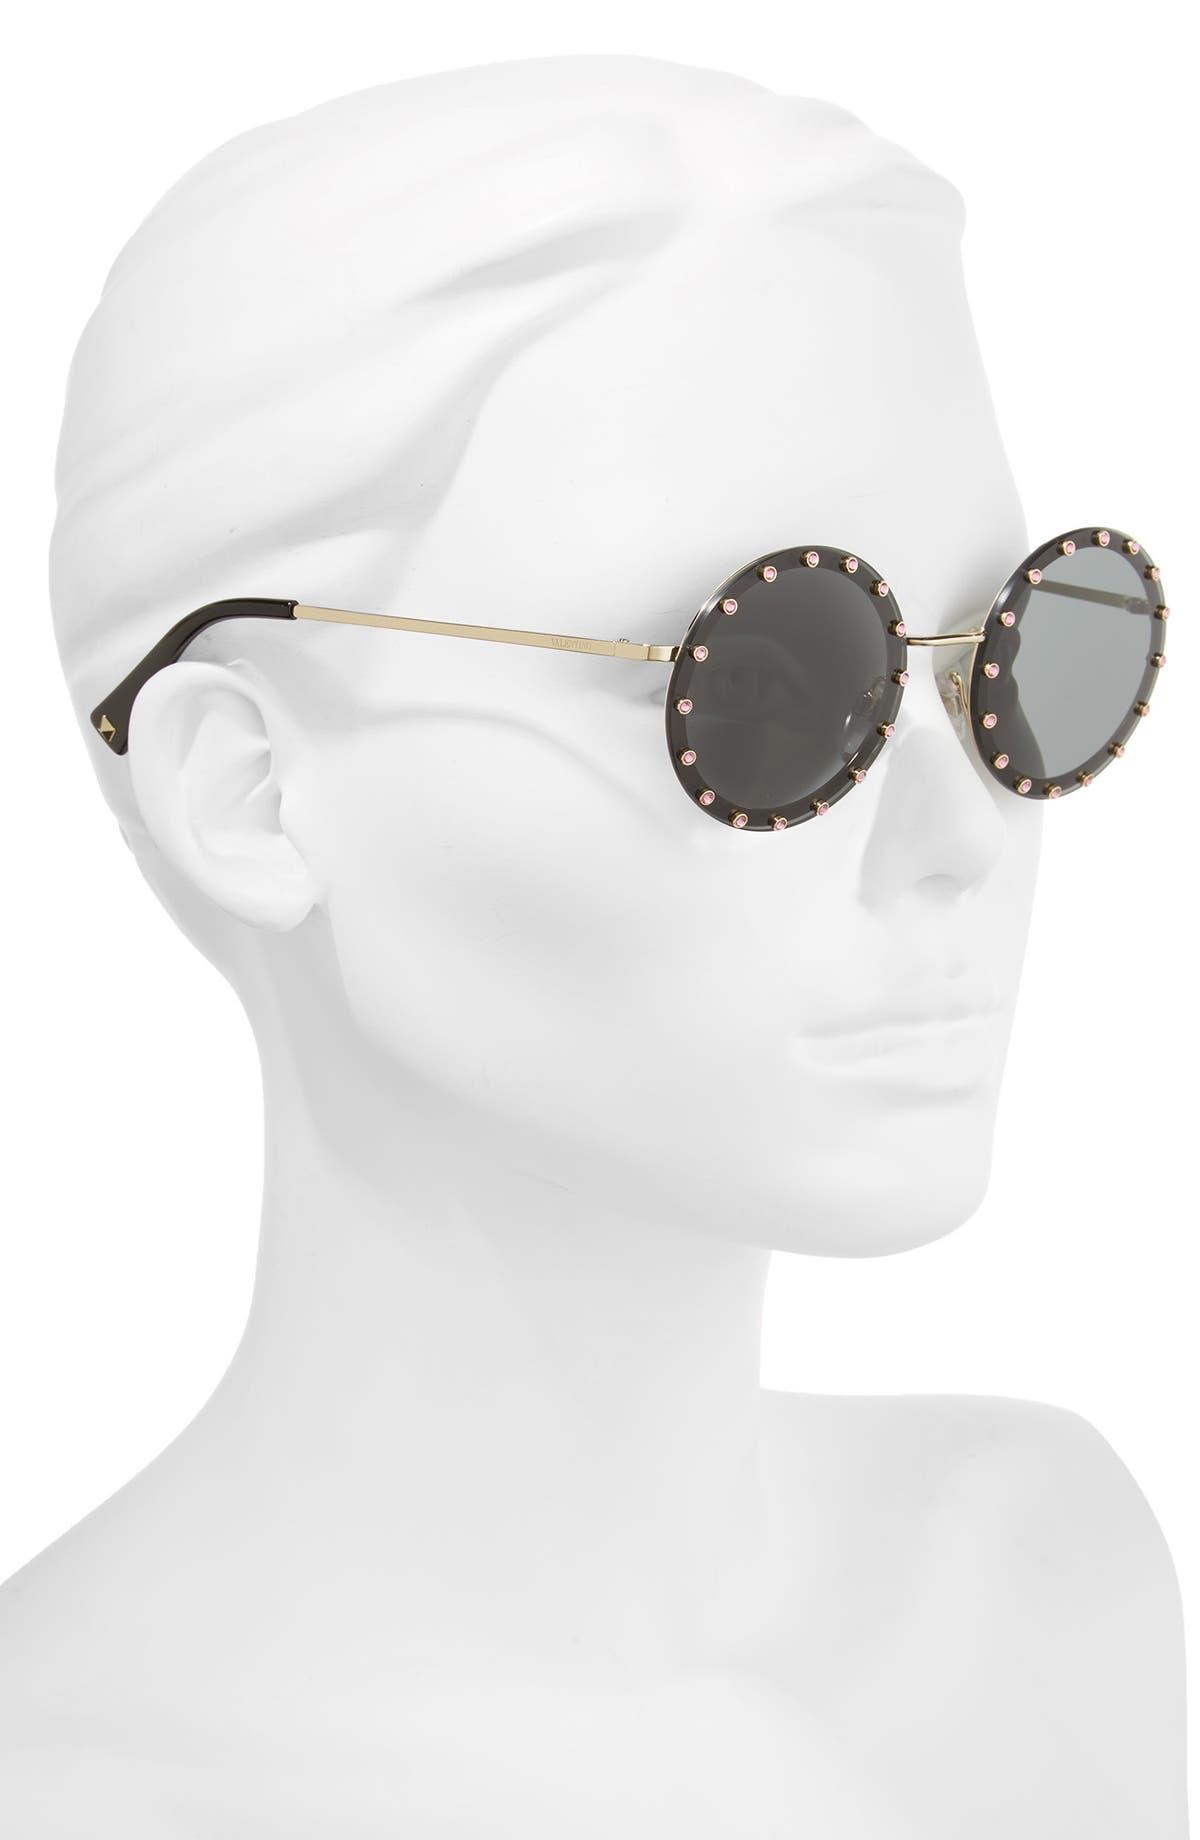 2f0064fdd5 Valentino 52mm Crystal Embellished Round Sunglasses